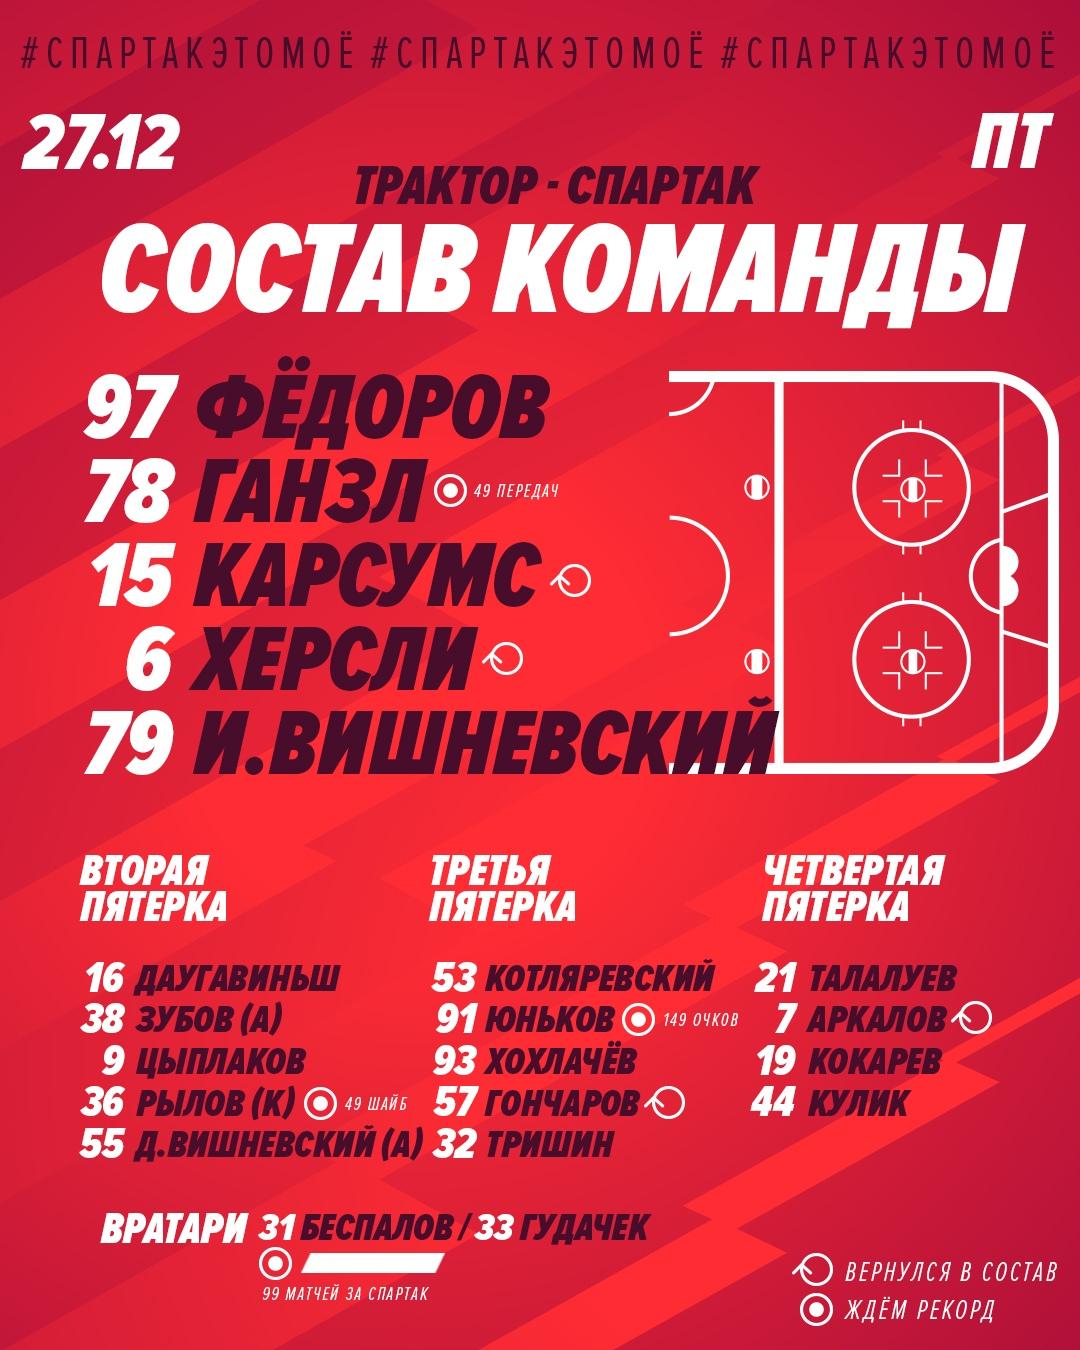 Состав «Спартака» на матч с «Трактором»